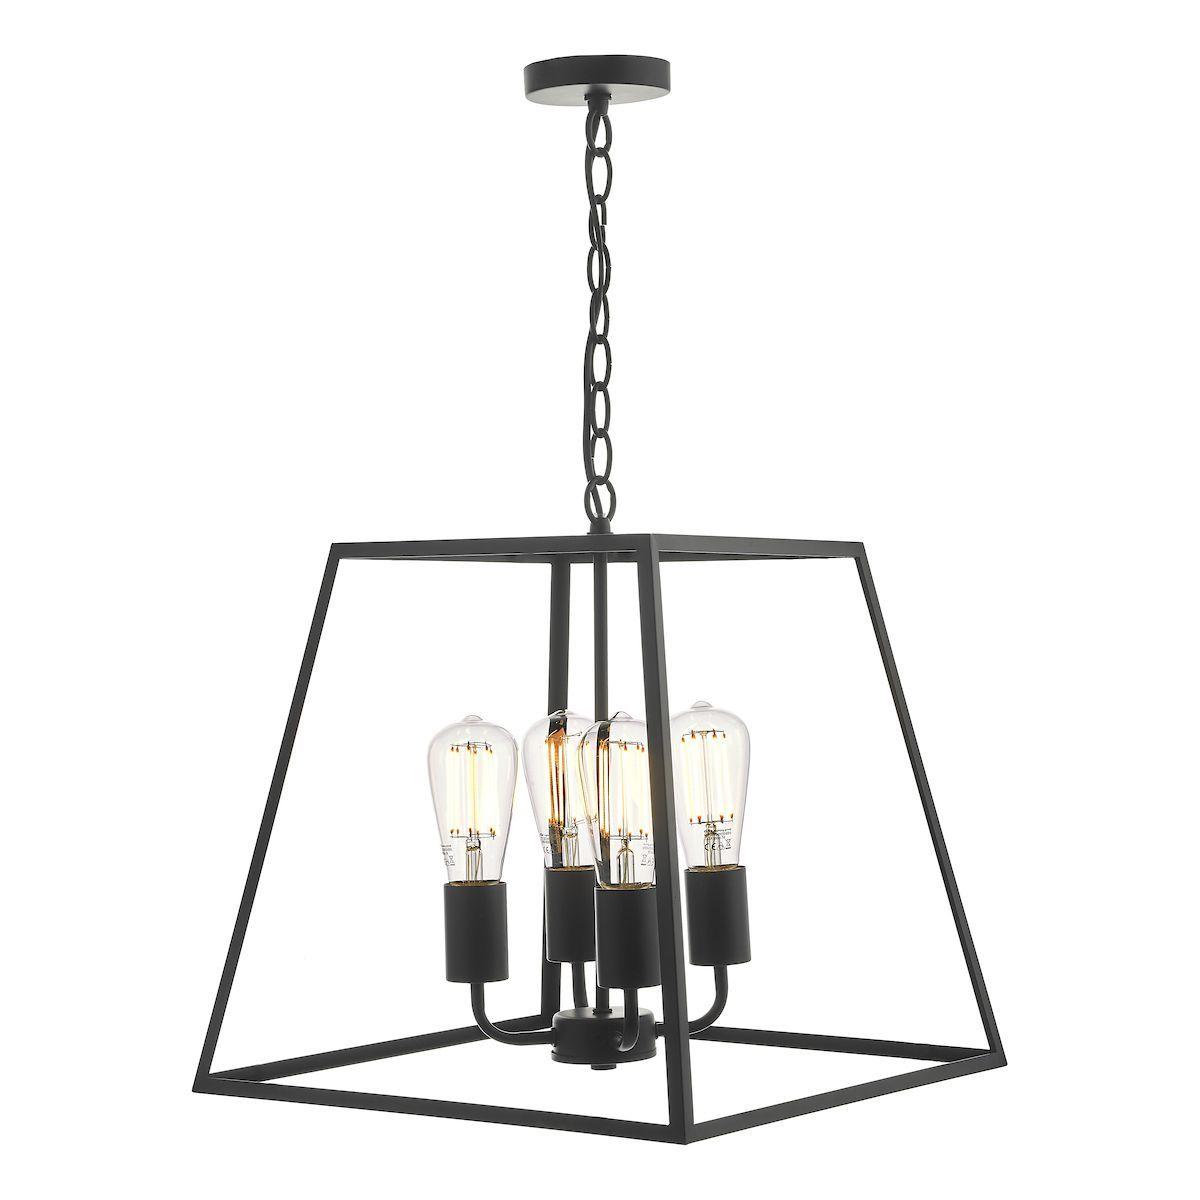 metalowa lampa wisząca latarnia czarna